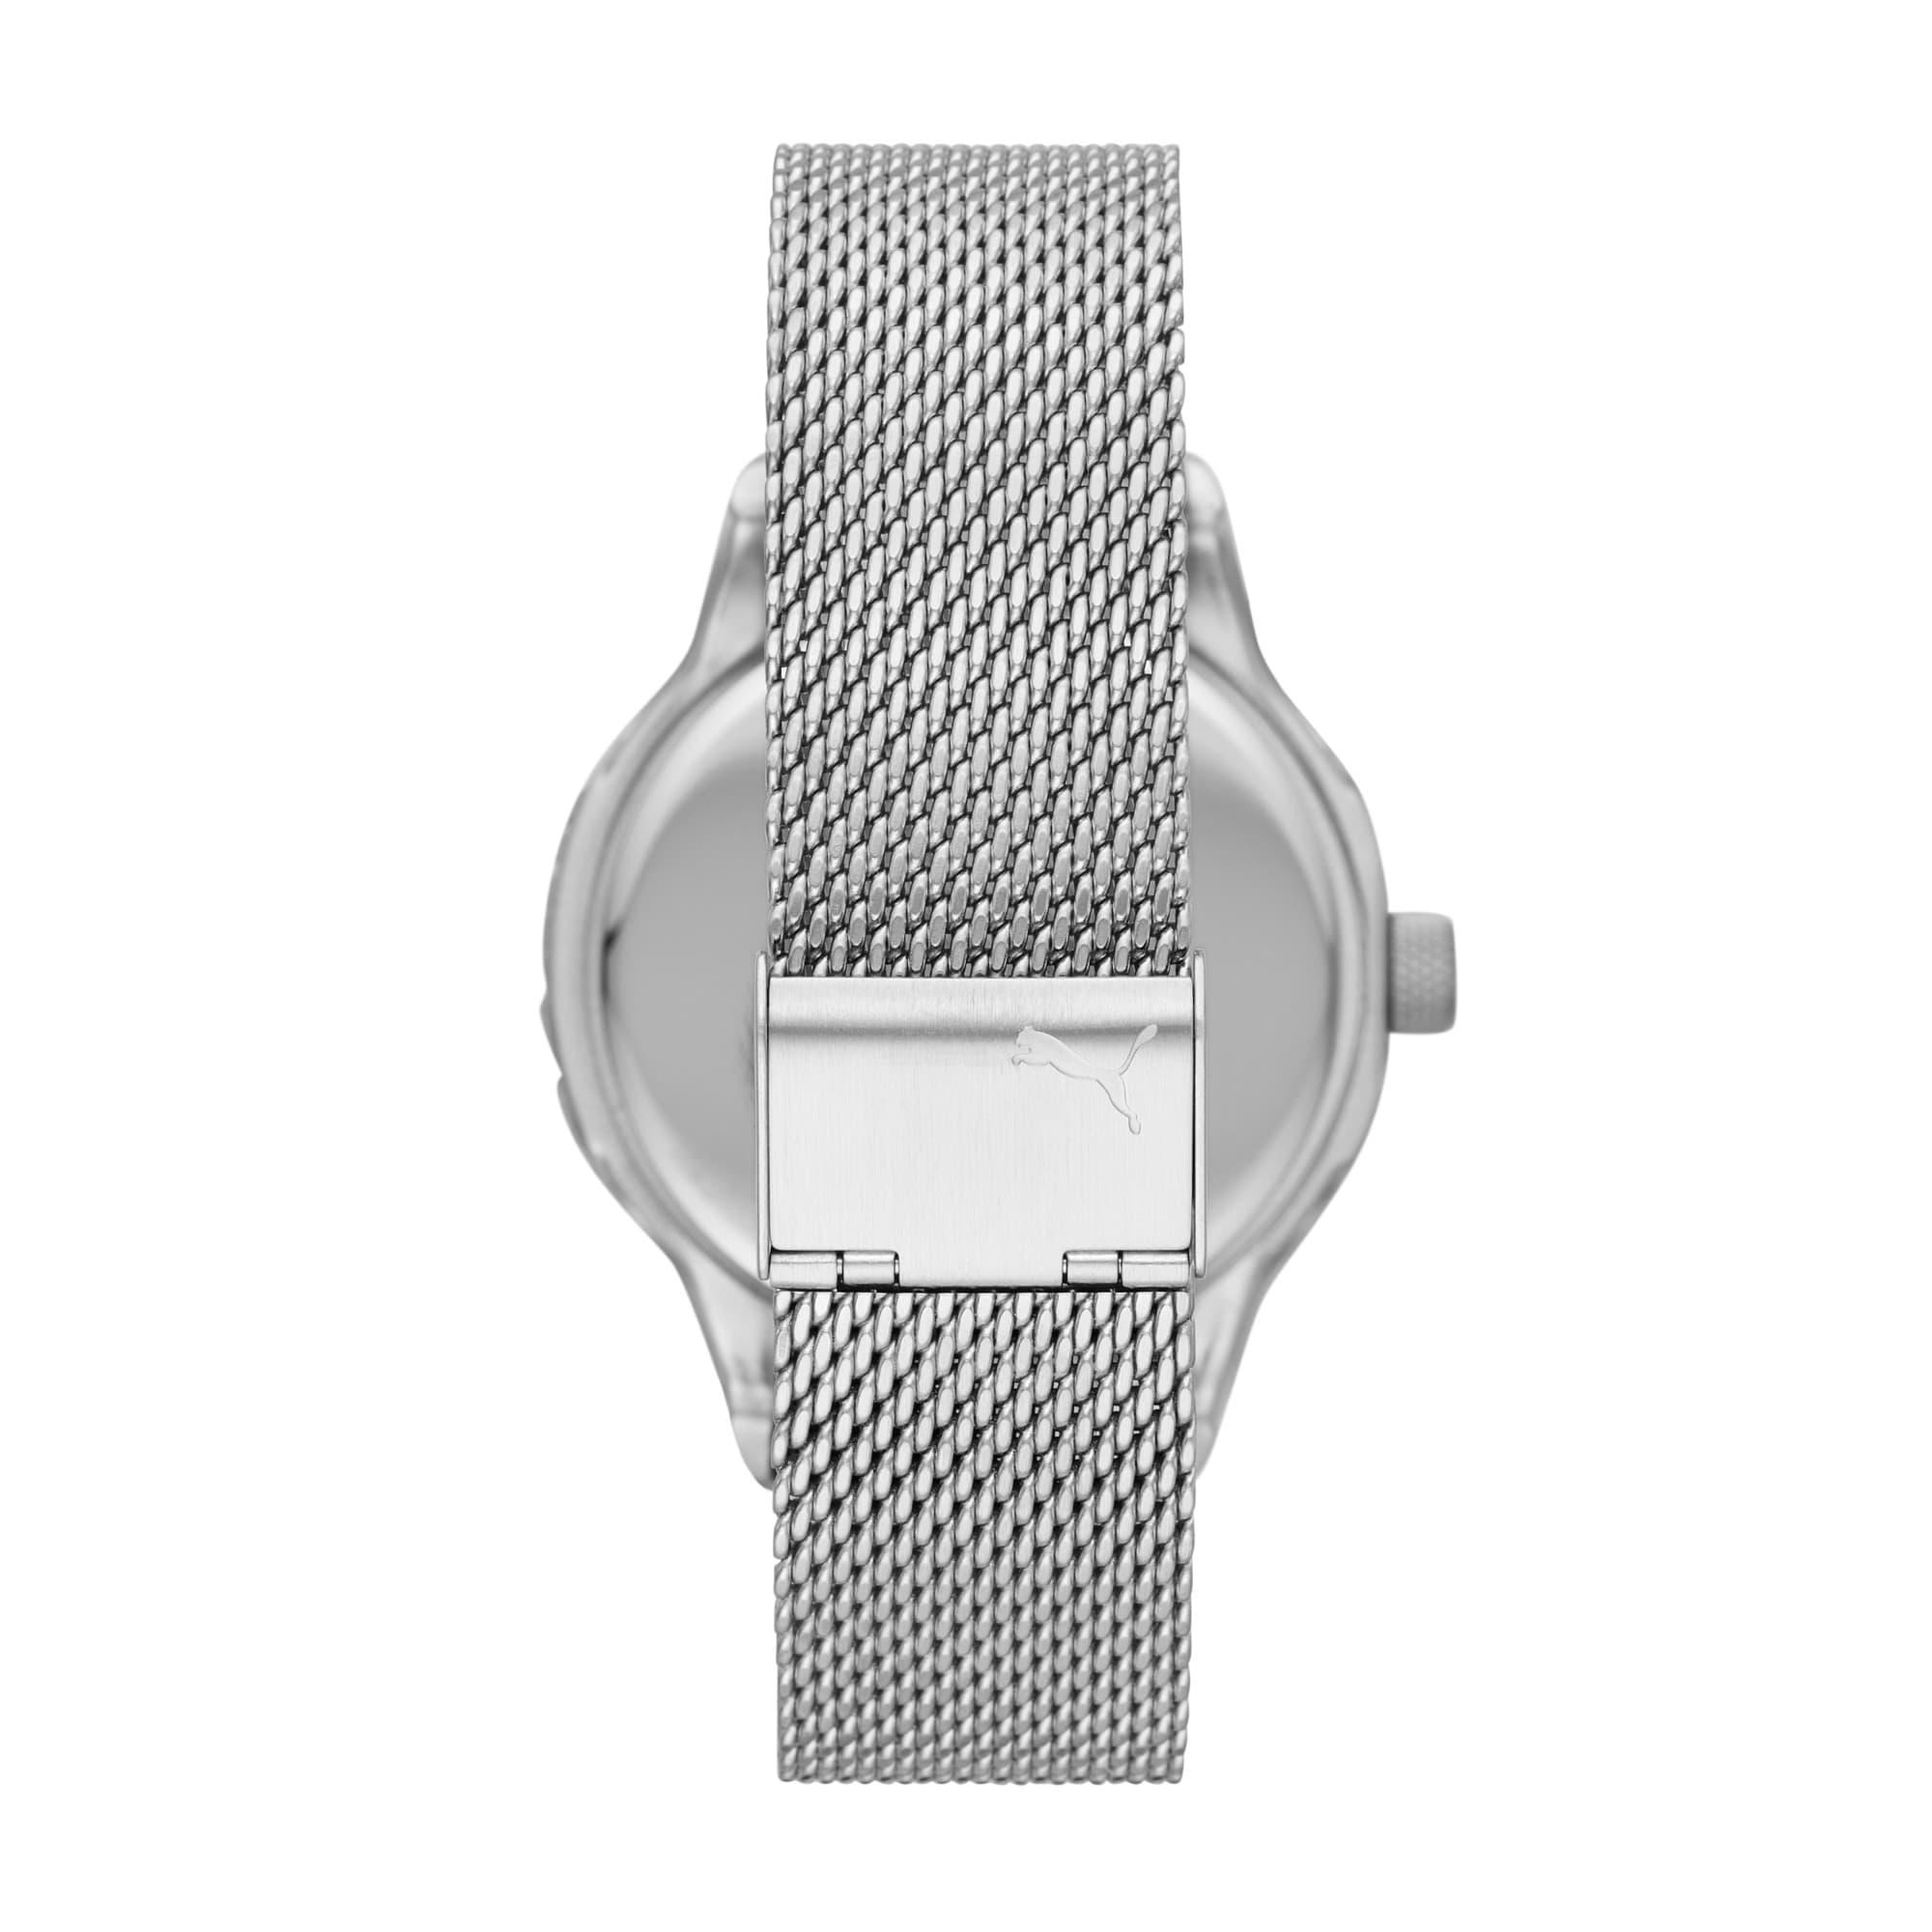 Thumbnail 3 of Reset v1 Watch, Silver/Silver, medium